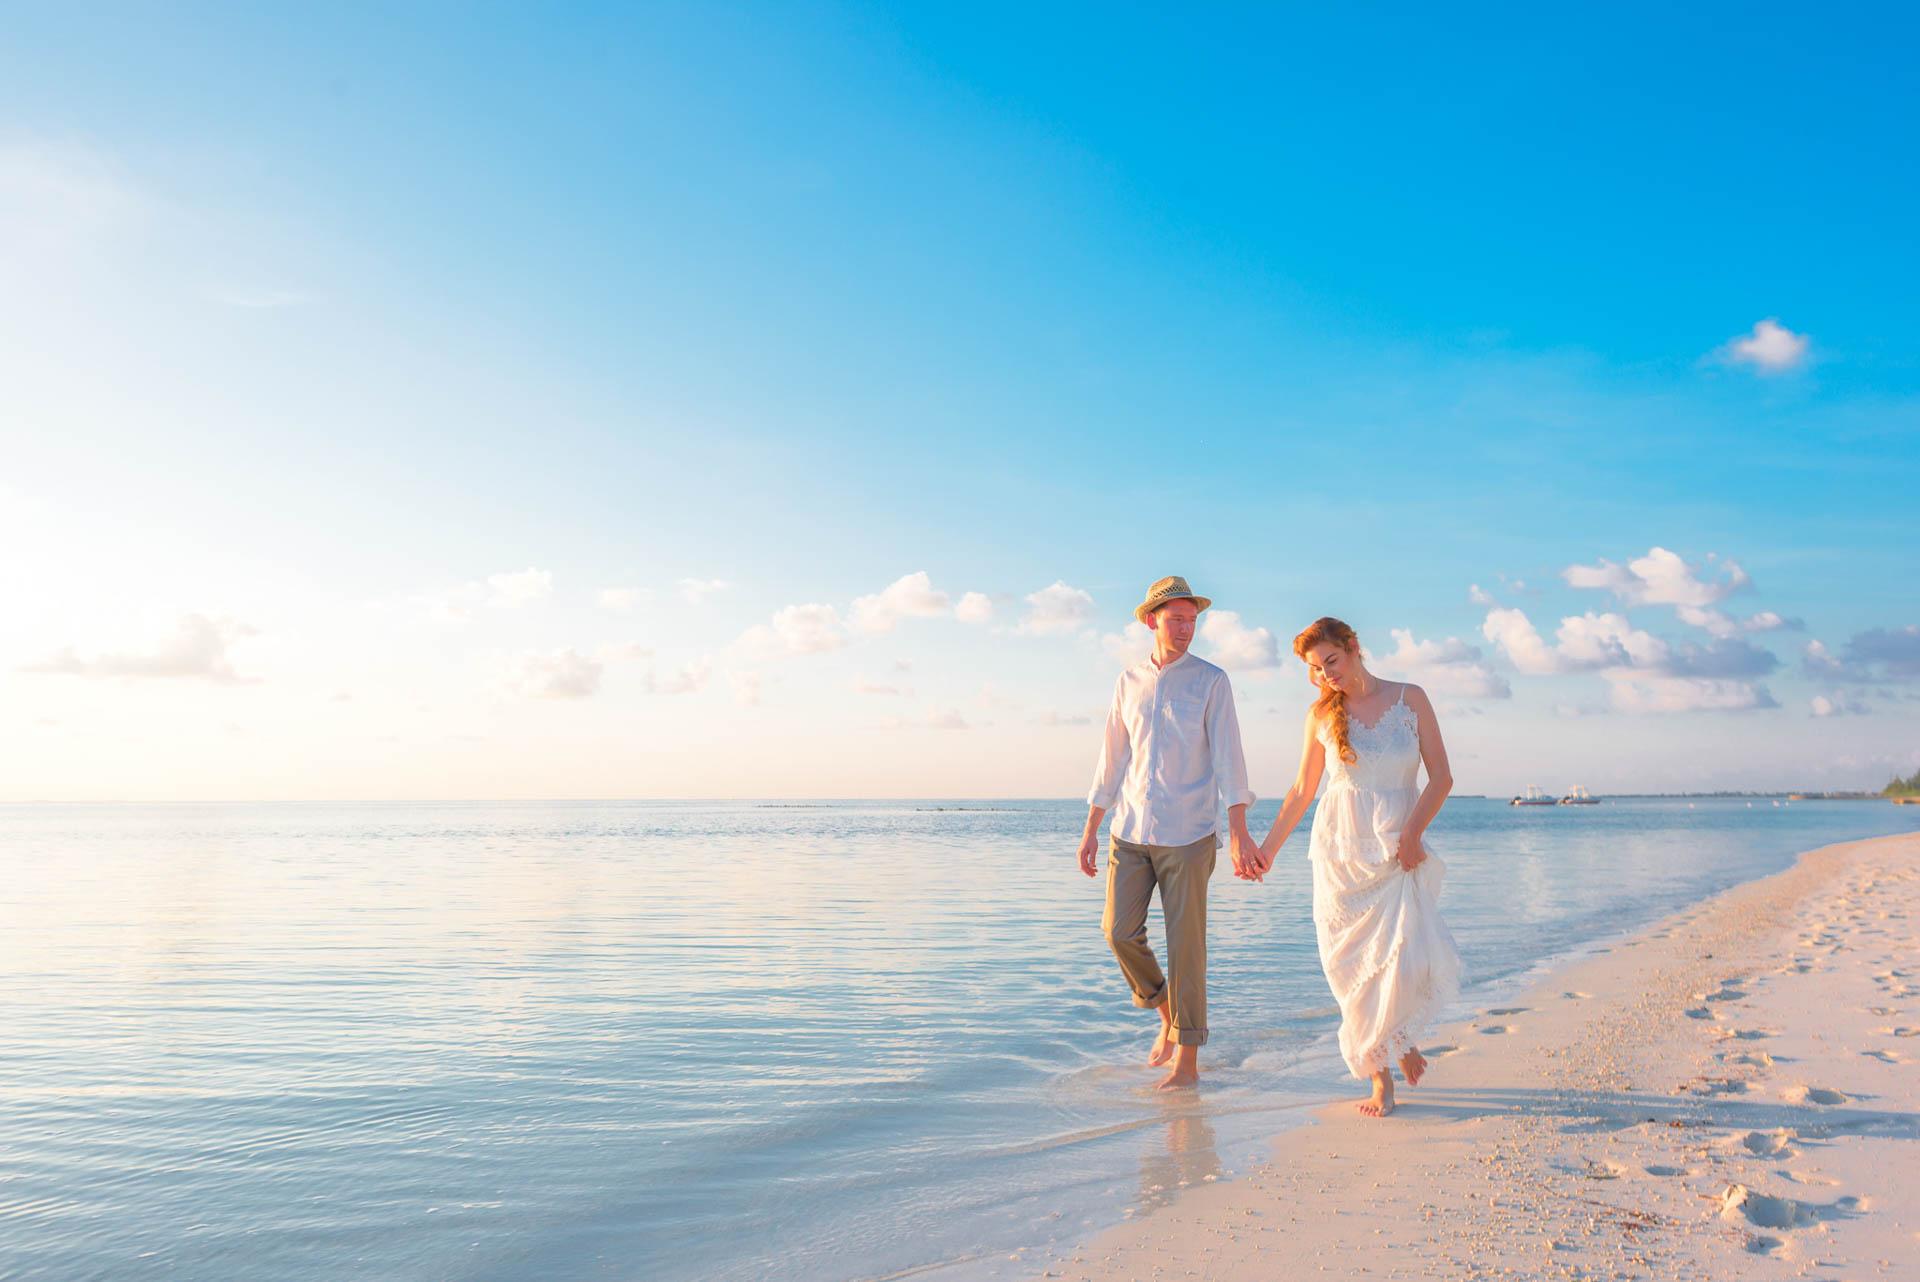 Heike Michaels Beach Wedding in Maldives 4